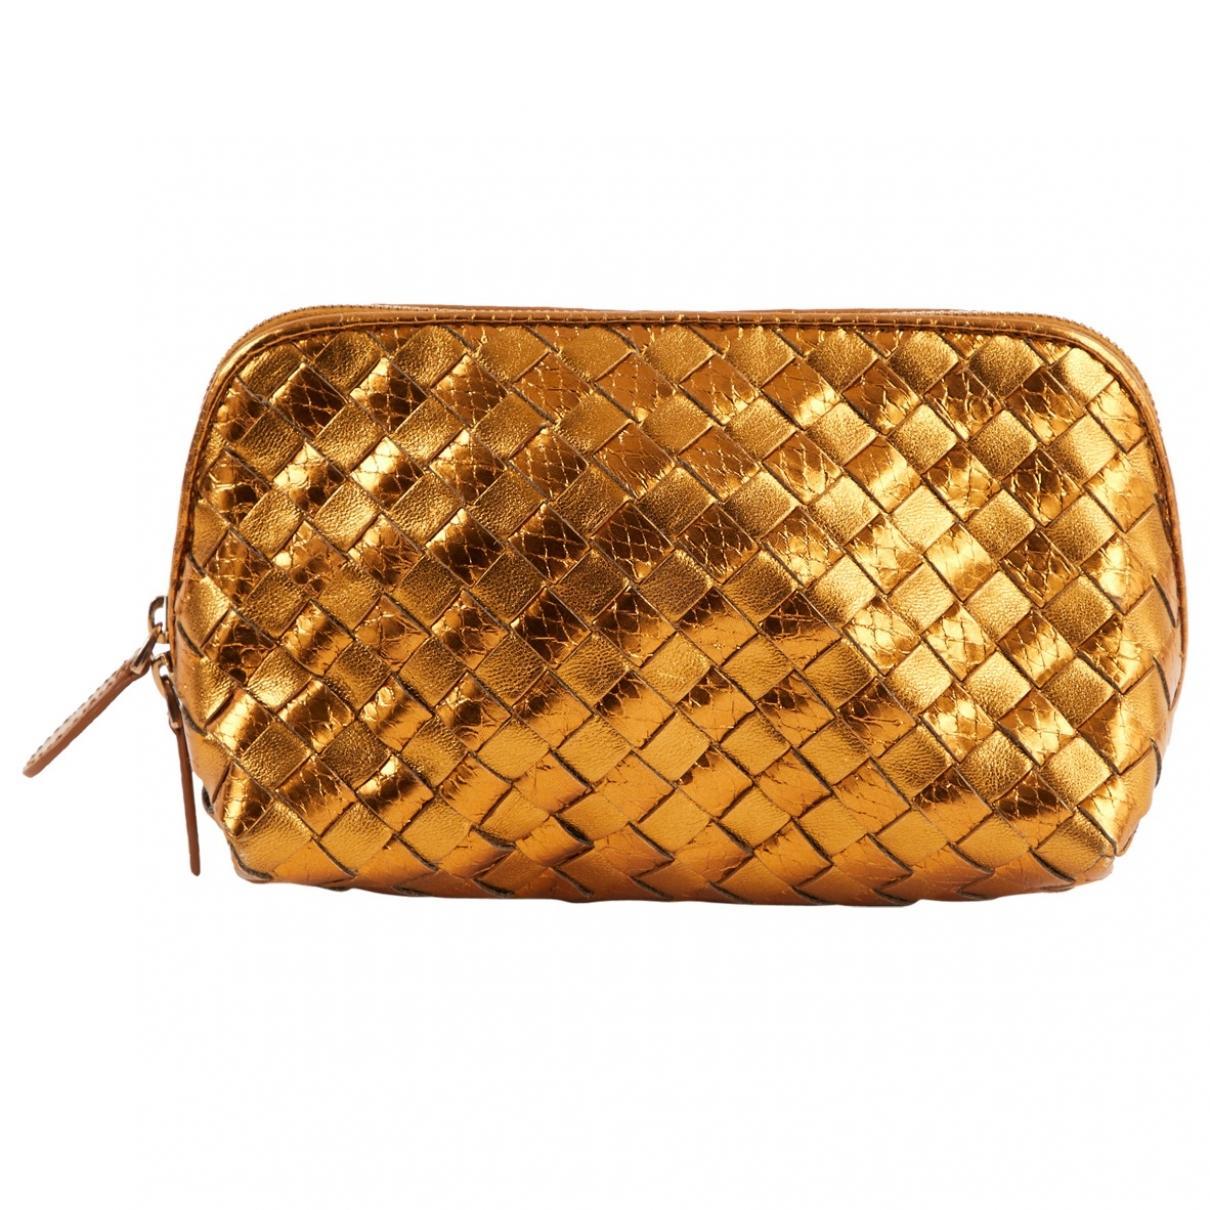 effe70e003 Lyst - Bottega Veneta Pre-owned Gold Leather Clutch Bags in Metallic